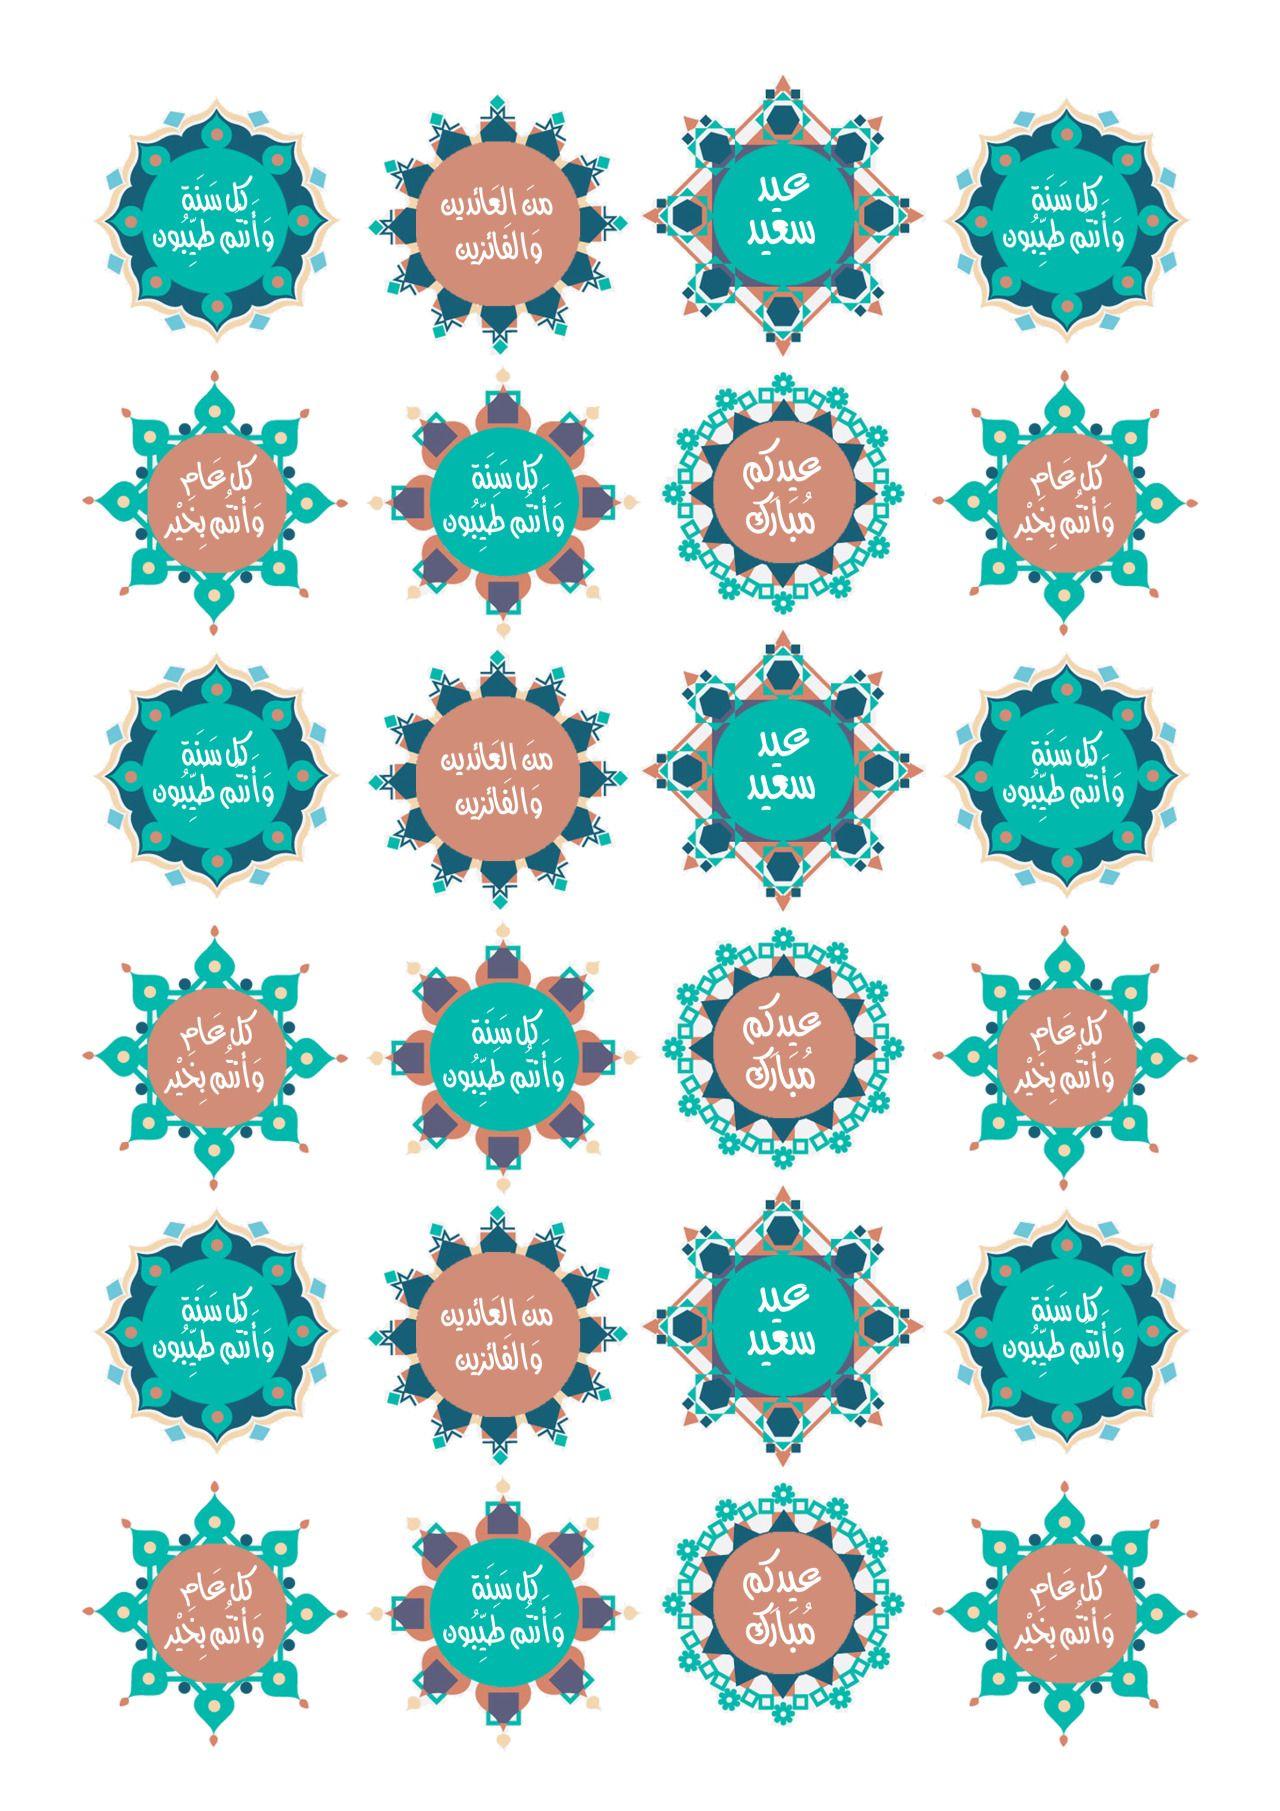 مطبوعات توزيعات عيد الفطر Eid Fitr Printables 2018 Eid Stickers Eid Mubarak Stickers Eid Cards